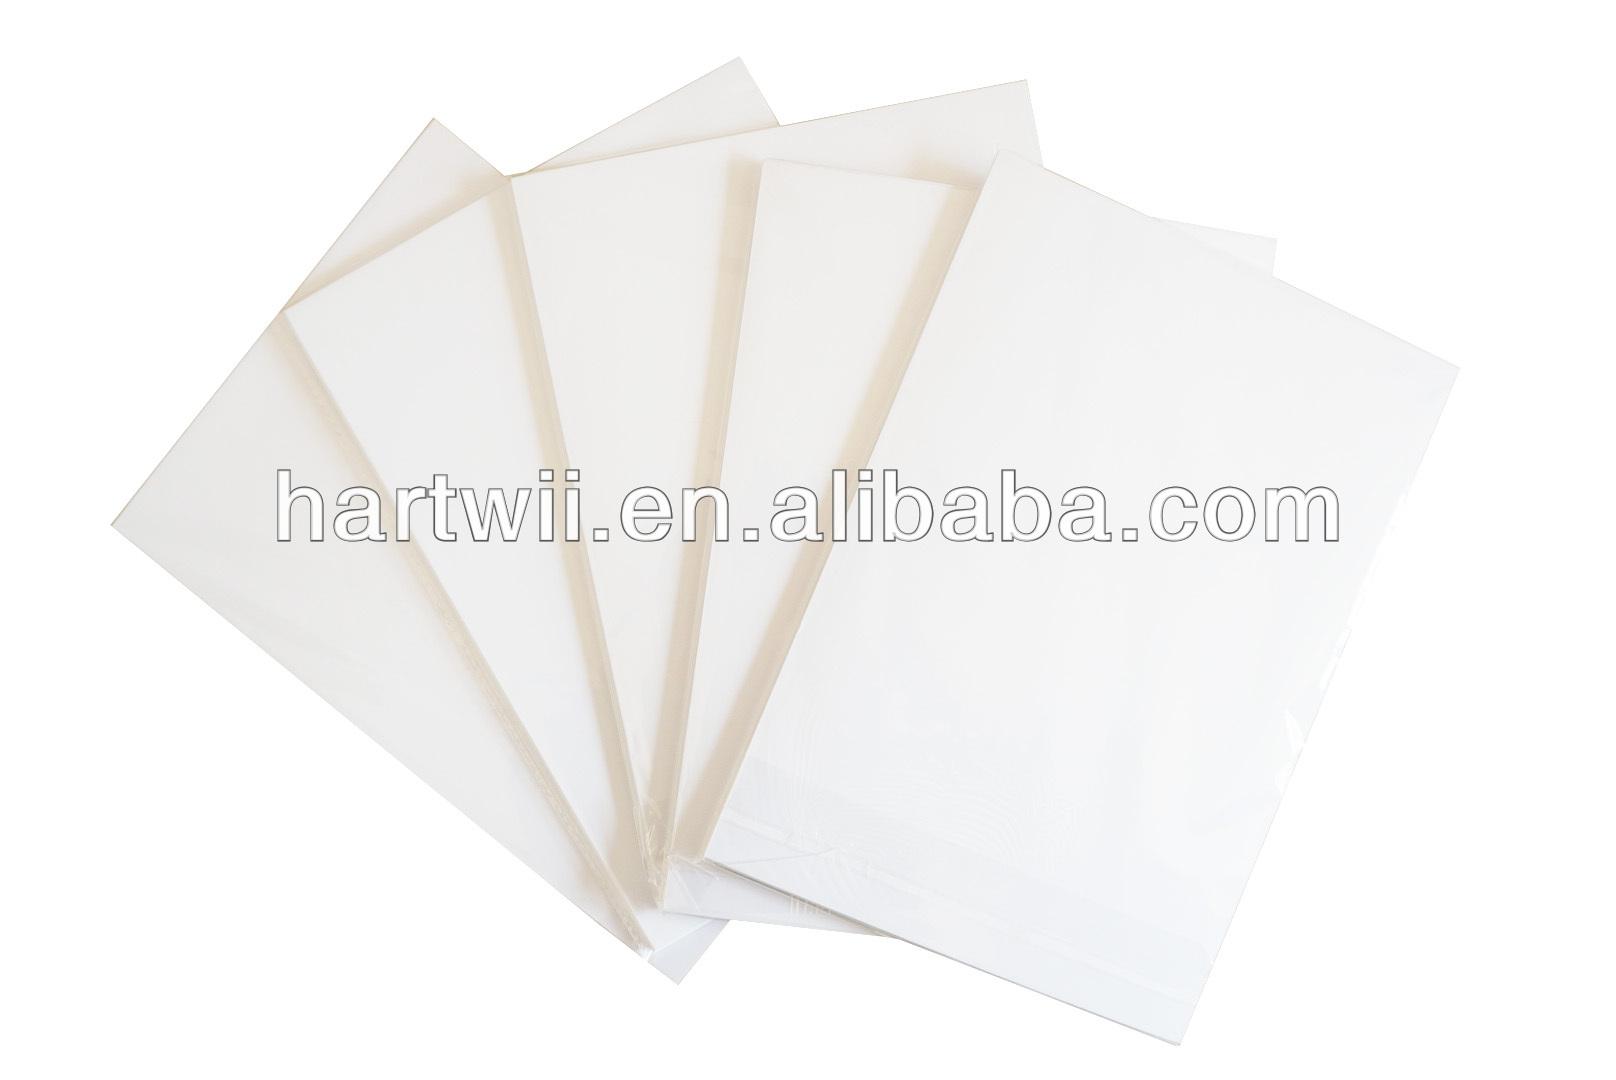 180g inkjet photo paper